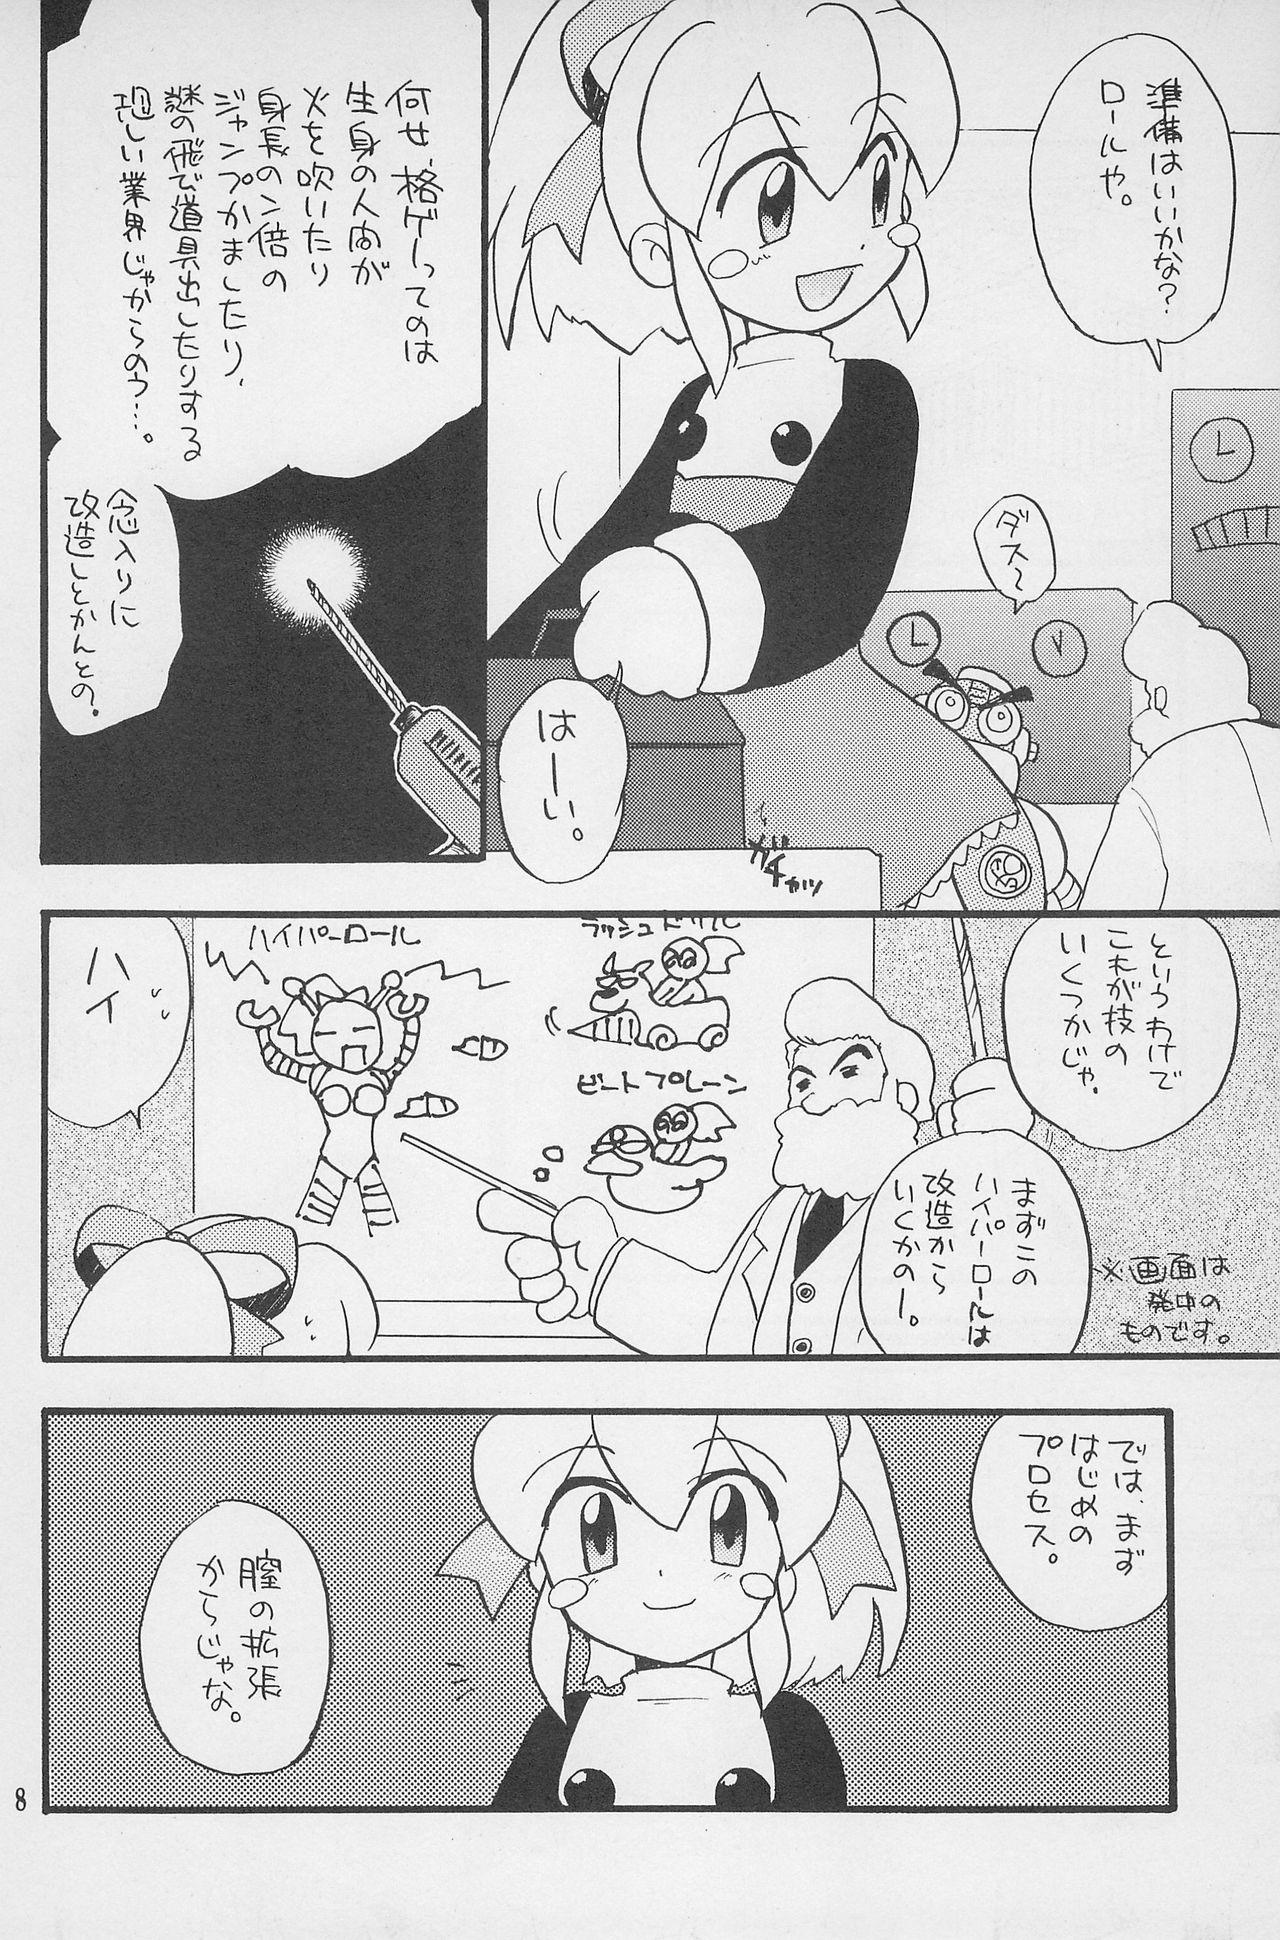 Super Loli Loli Daisakusen! 9